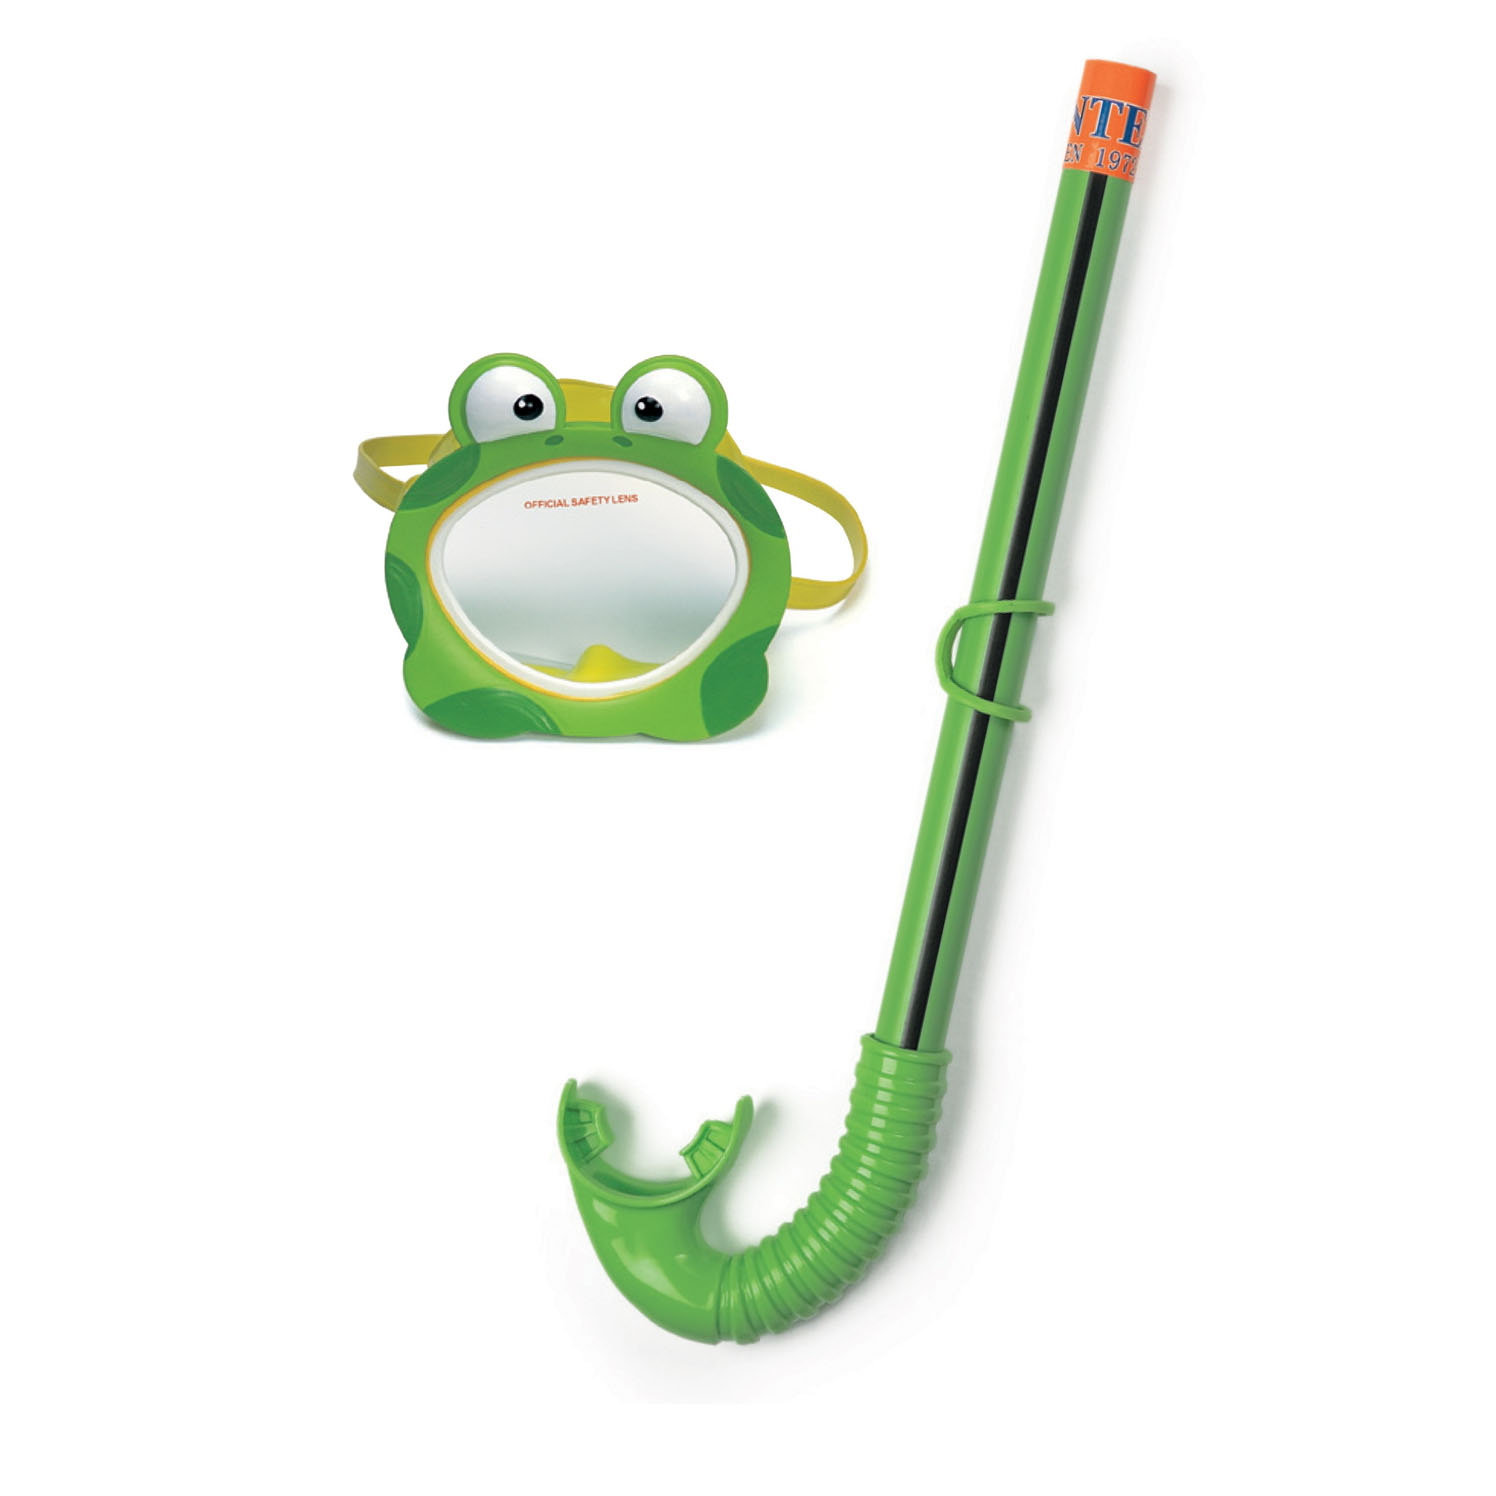 Маска и трубка для плаванья - Froggy Fun - ЛягушкаМаски, ласты, трубки для плавания<br>Маска и трубка для плаванья - Froggy Fun - Лягушка<br>